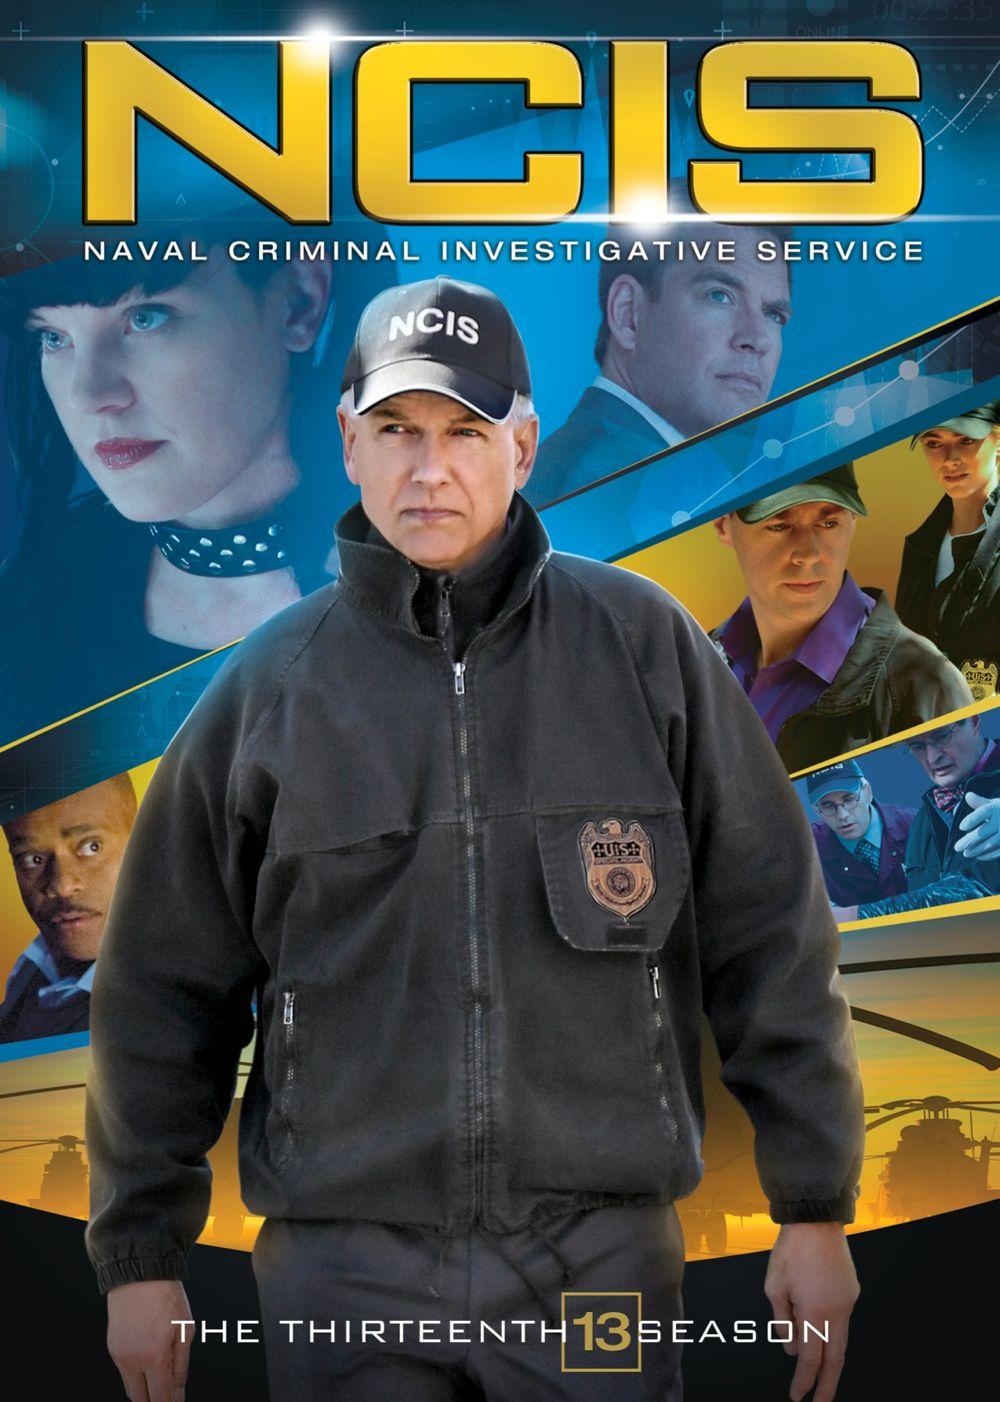 NCIS Season 13 DVD Cover